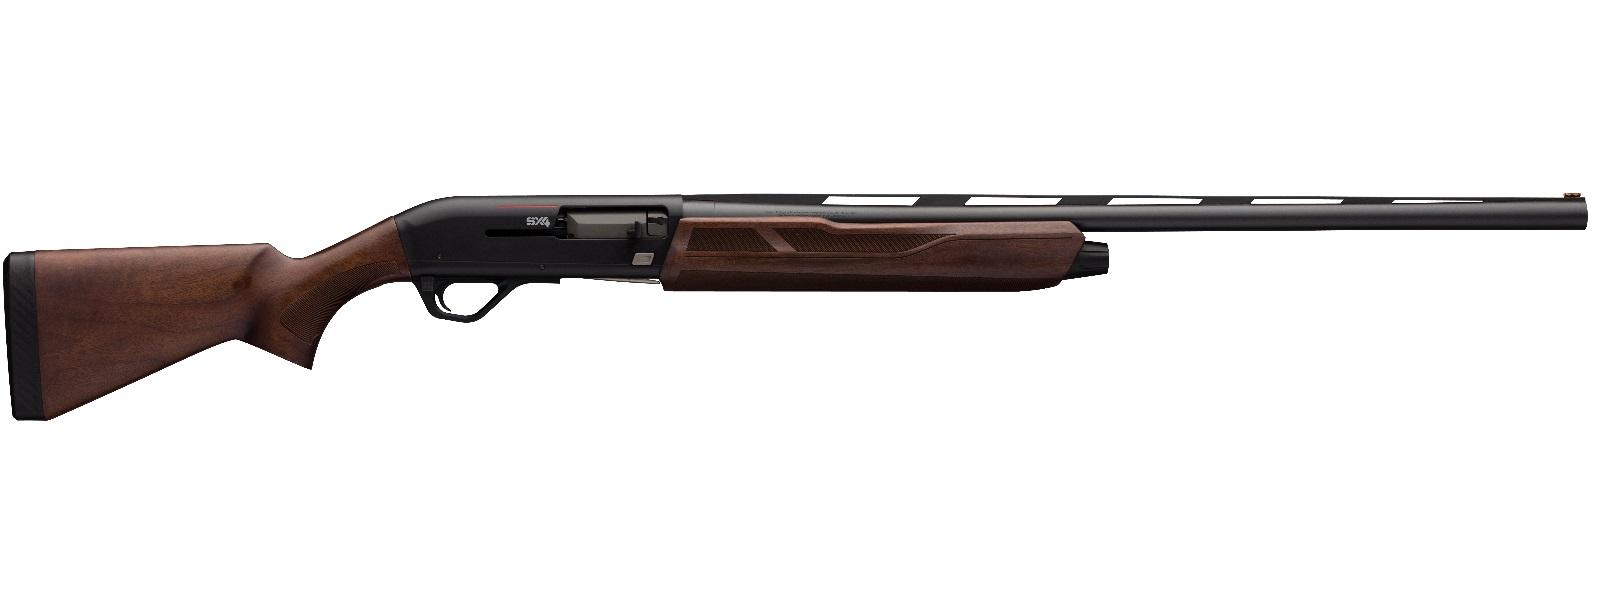 Winchester SX4 Field Compact 20 Gauge